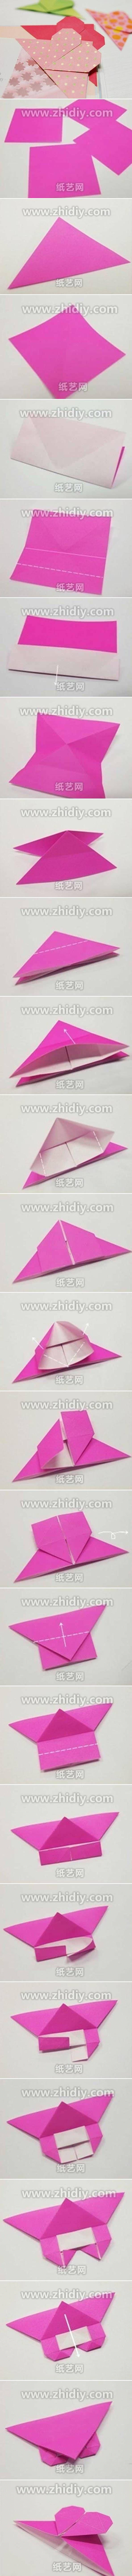 Origami Heart Shaped Bookmark